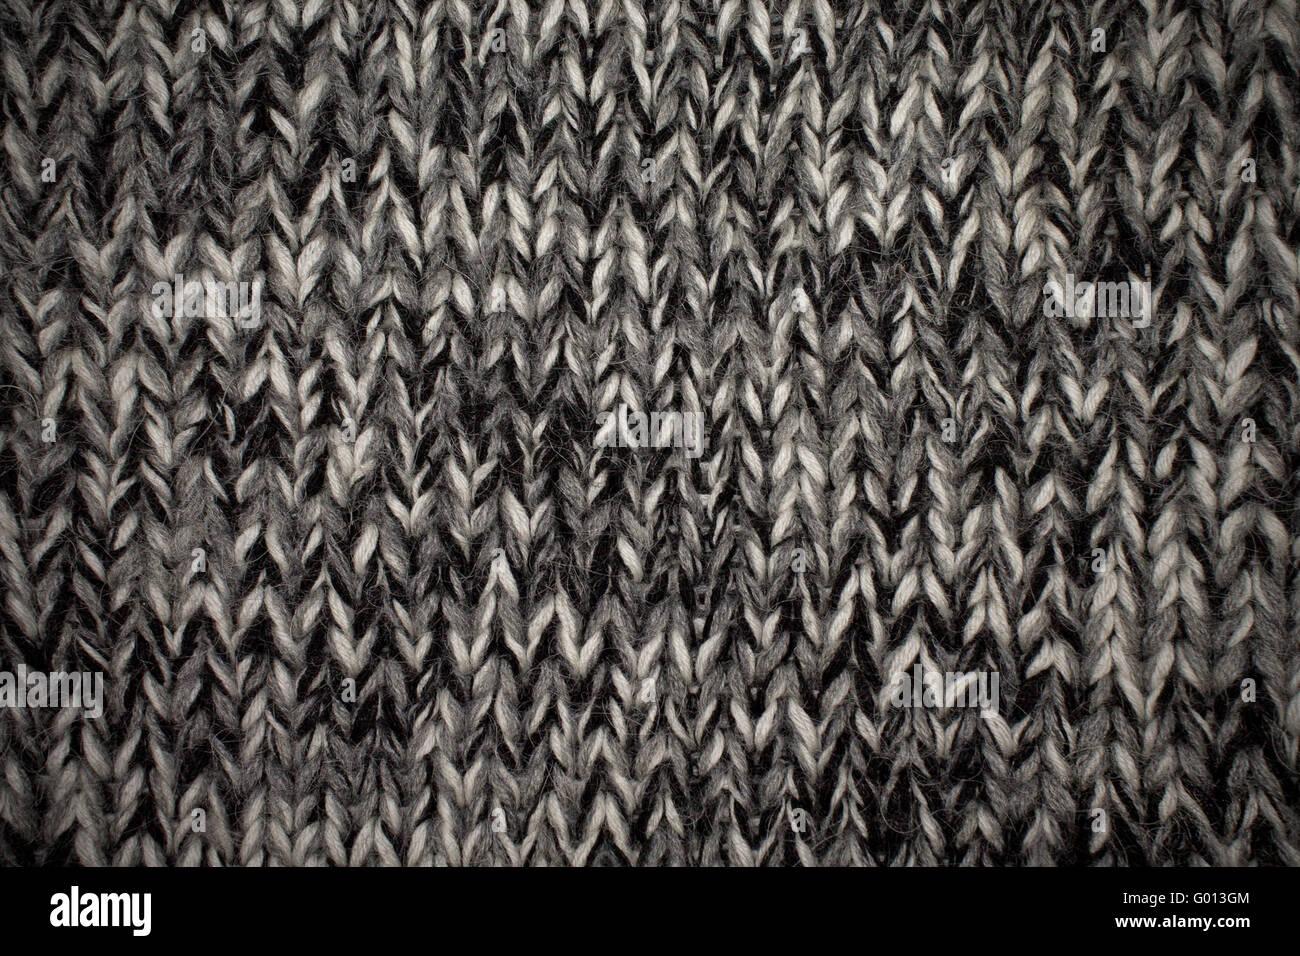 Close Up Photography Of Gray Knit Textile: Melange Knit Fabric Texture Closeup Stock Photo: 103286980